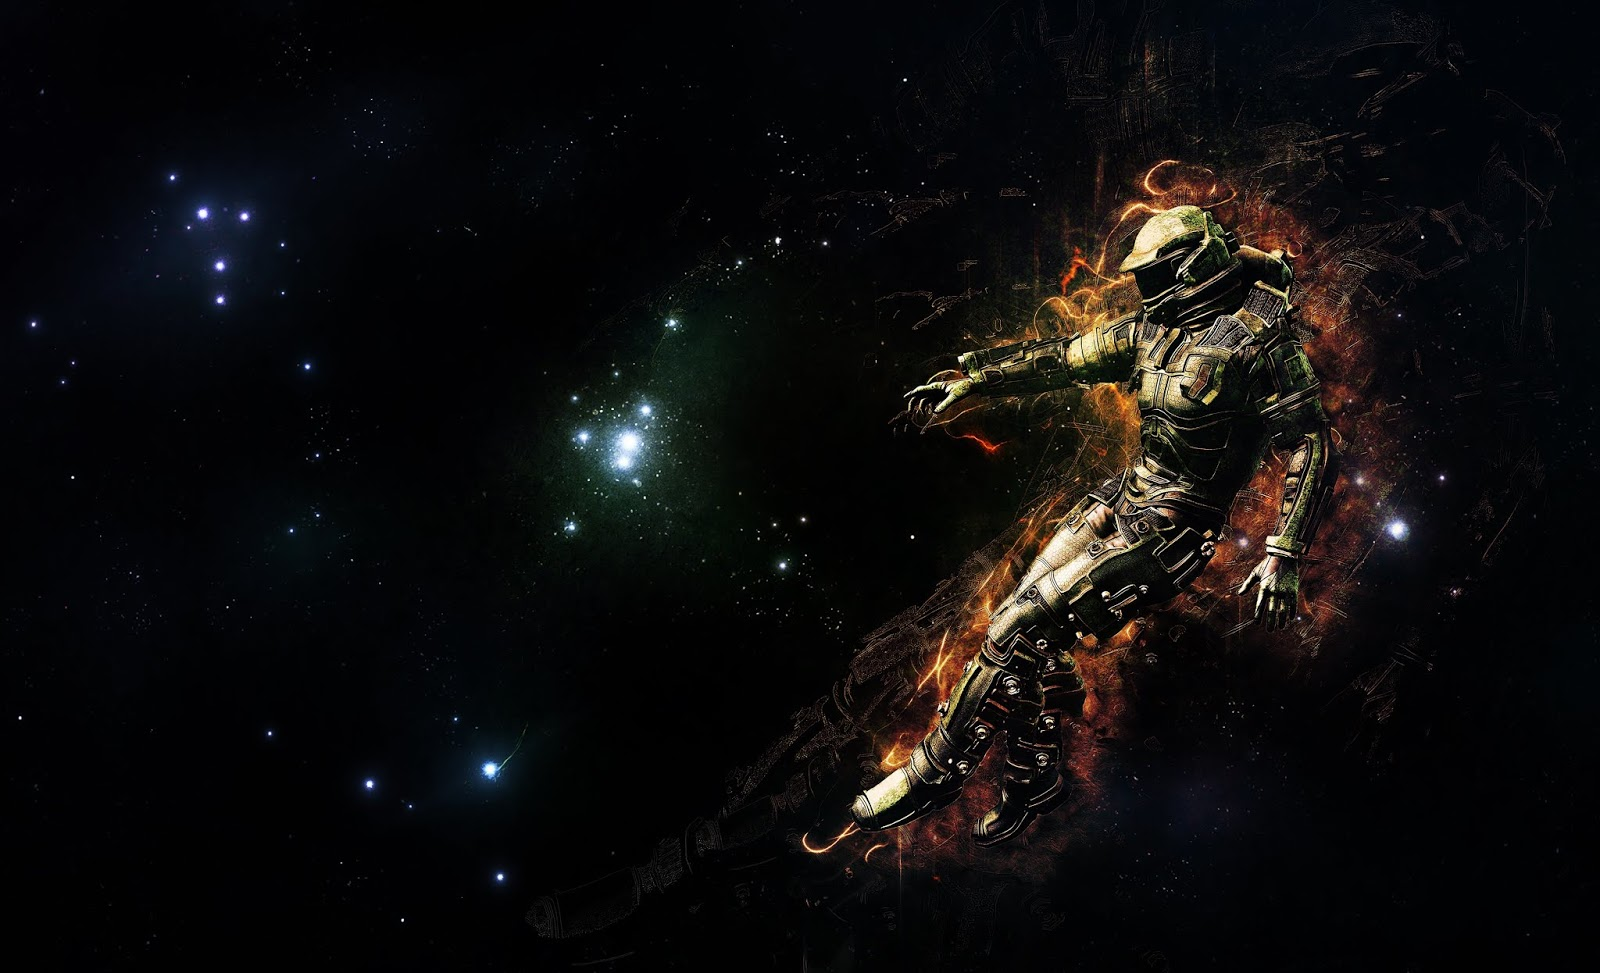 Astronaut, 4K, Creative Graphics, Space